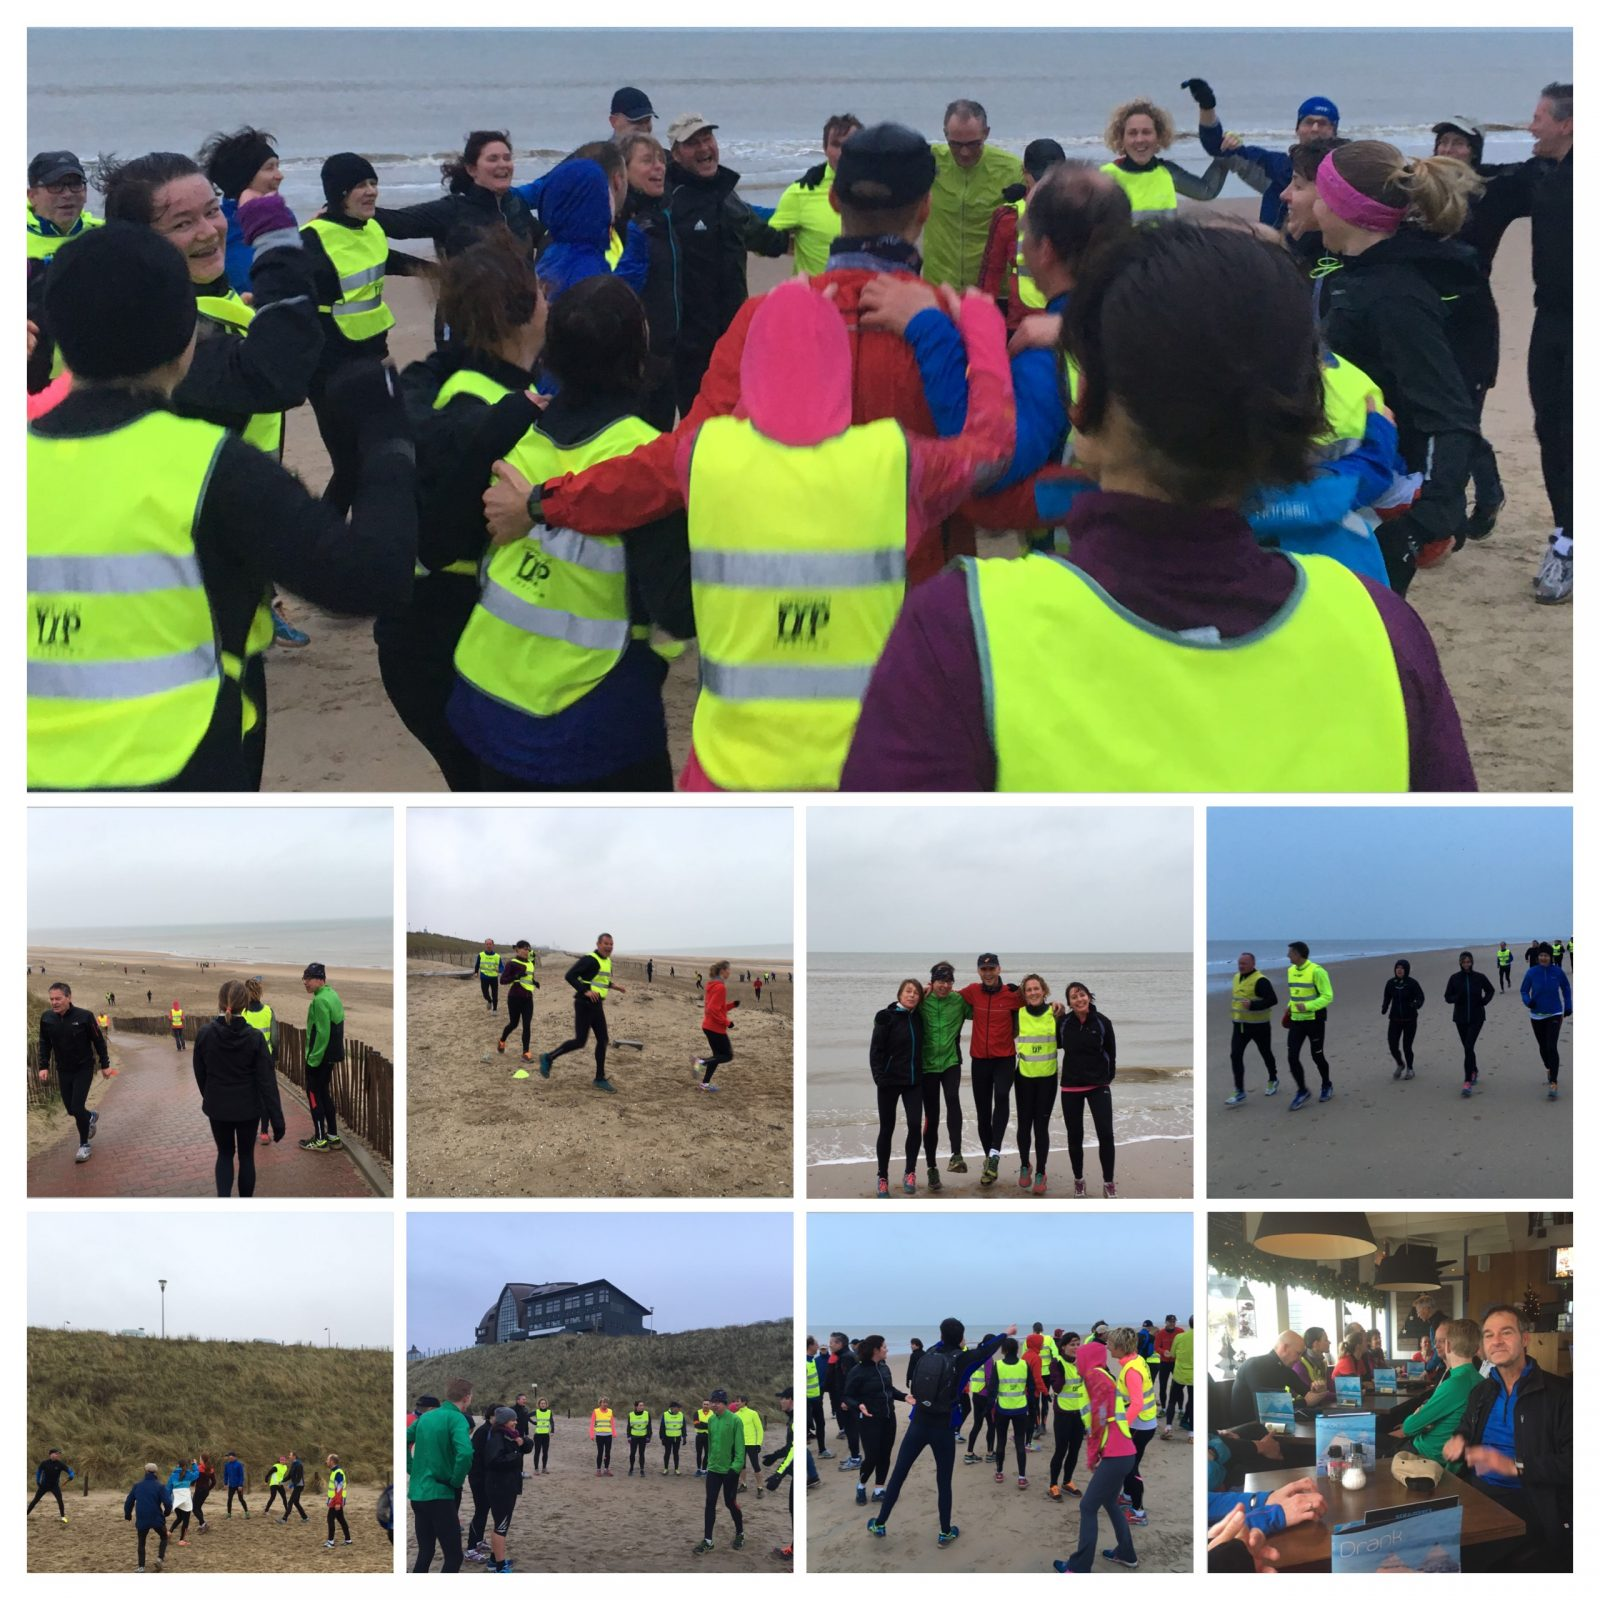 Oliebollentraining strand 2 januari